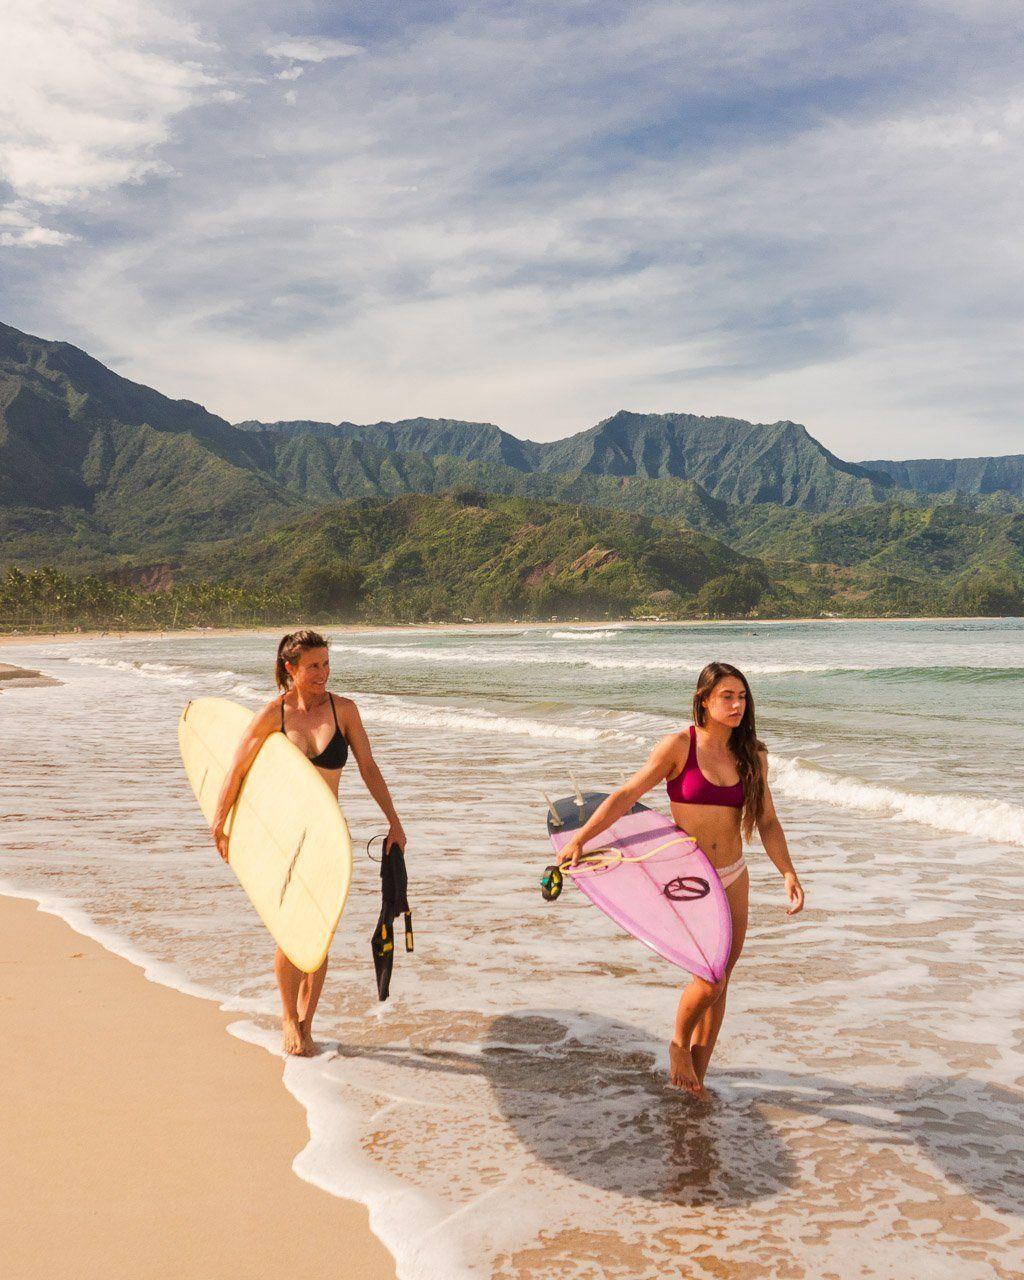 Surfing Hanalei Bay: Things to do Kauai